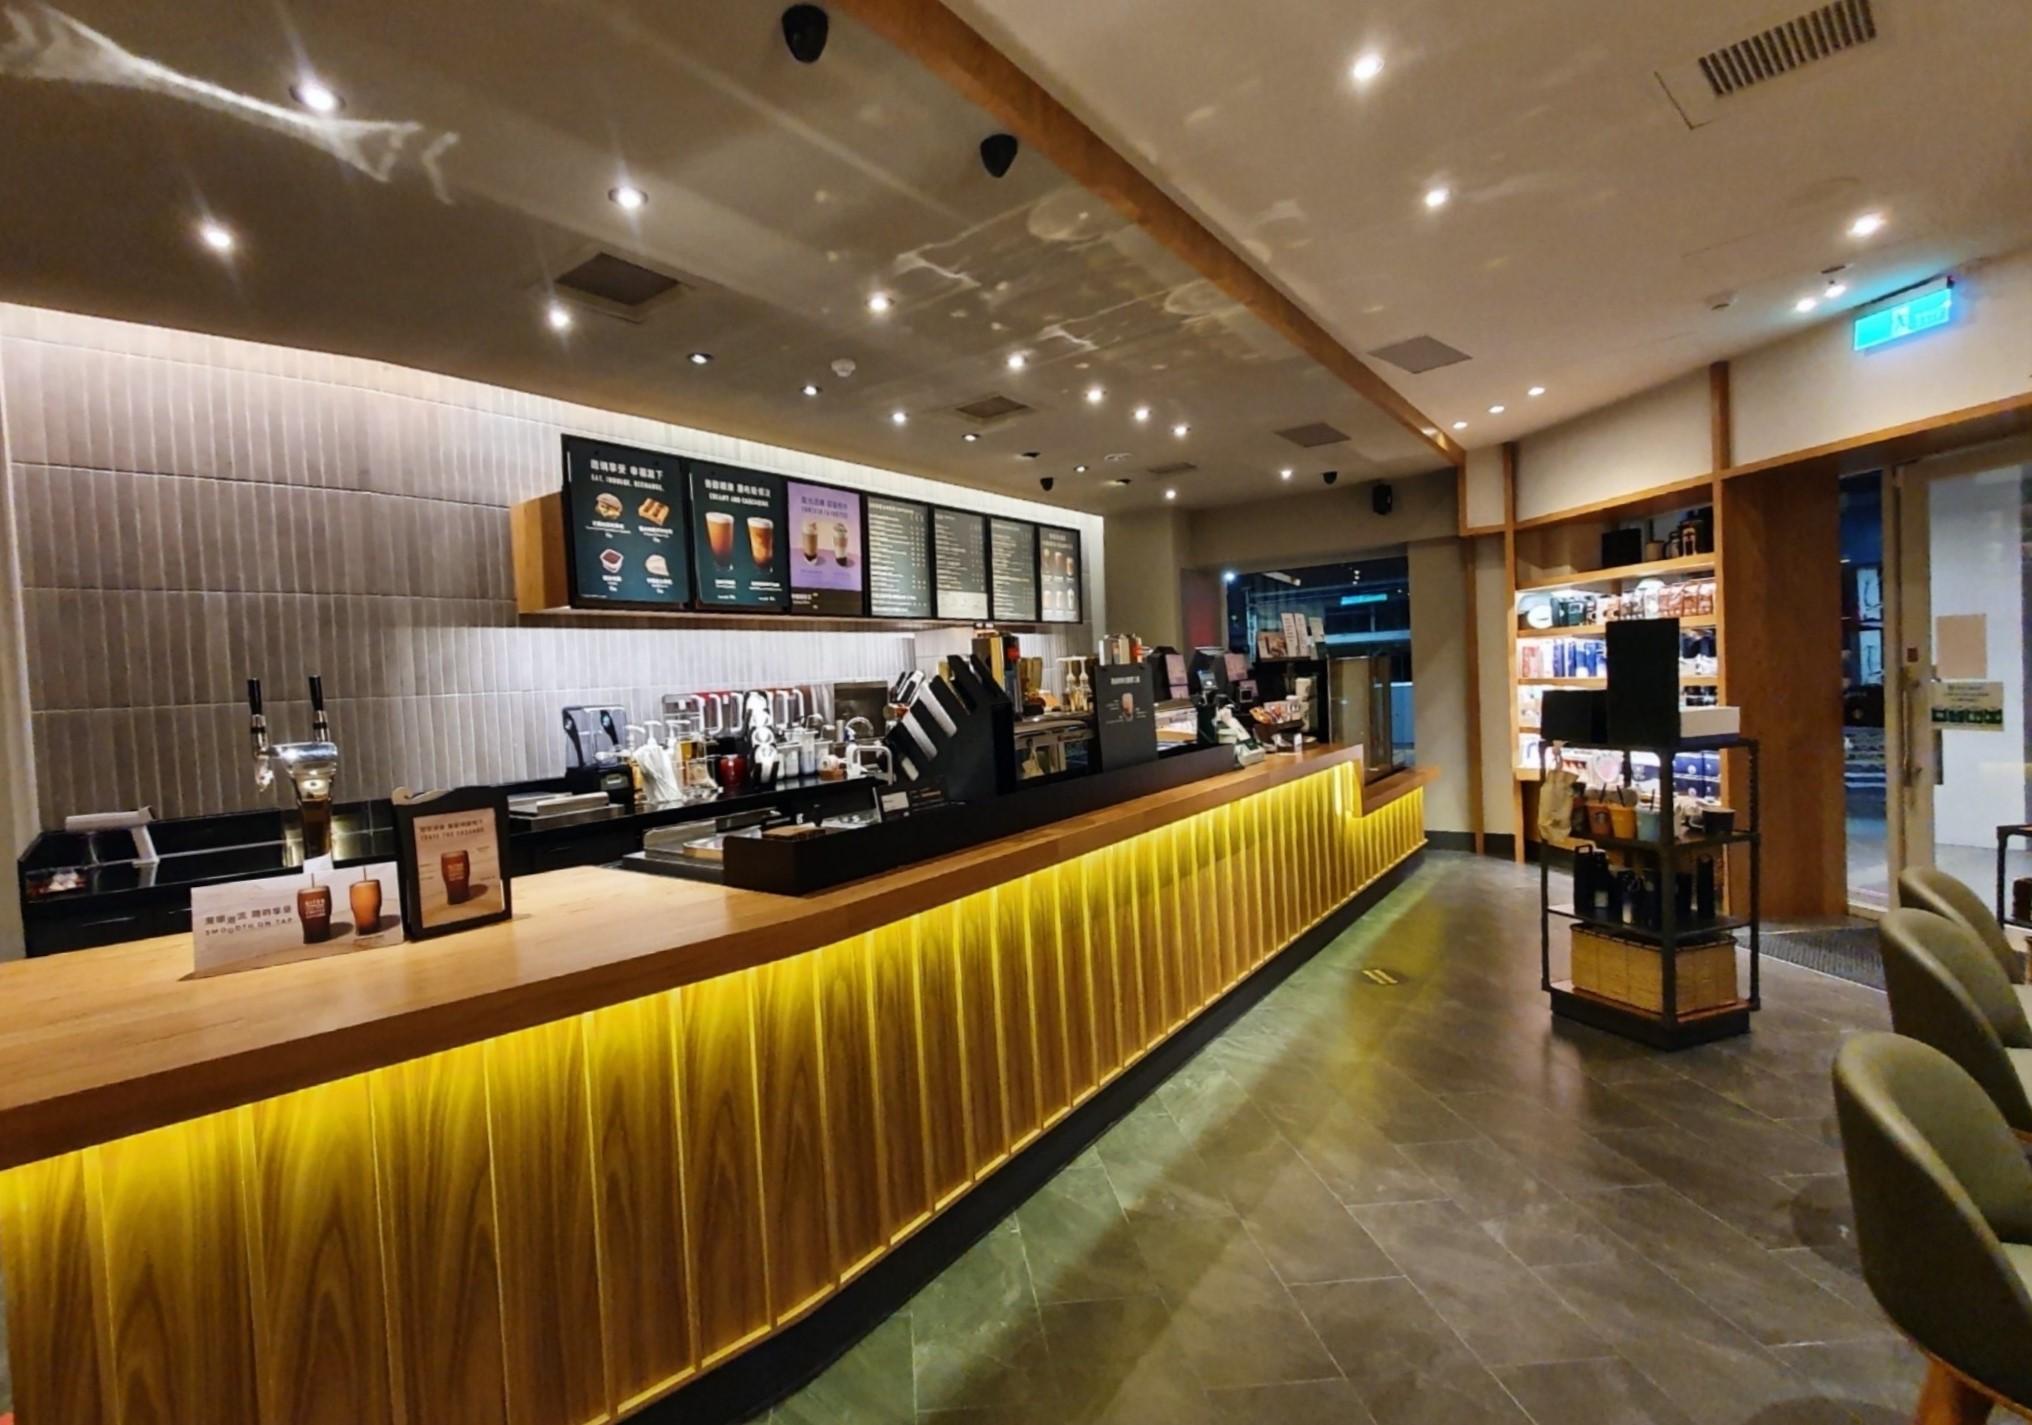 Starbucks 星巴克 》嘉義市府門市 盛大開幕活動!消費享滿額贈!【2021/9/4 起】